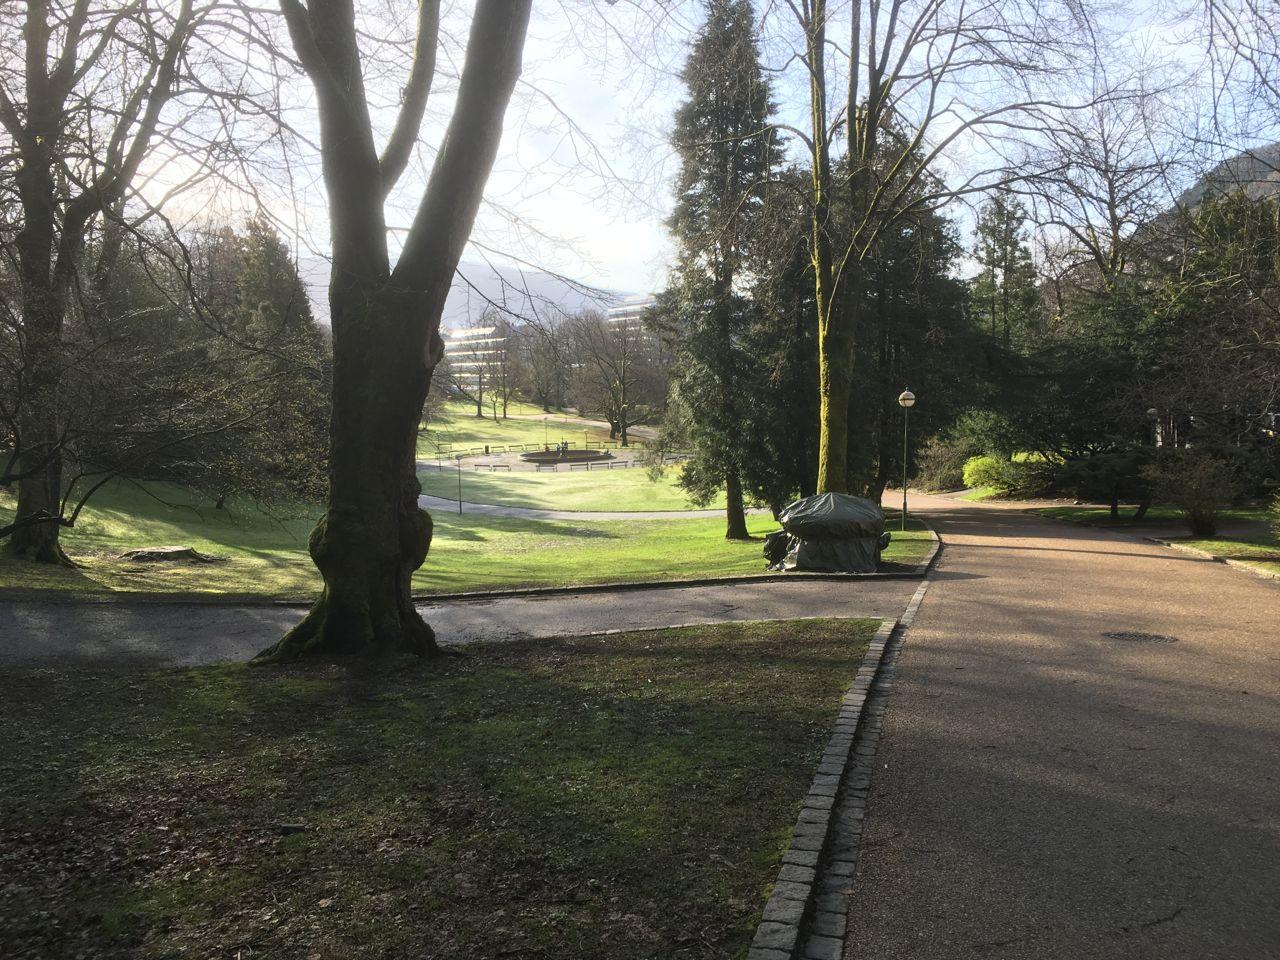 Nygårdsparken park. Photo.